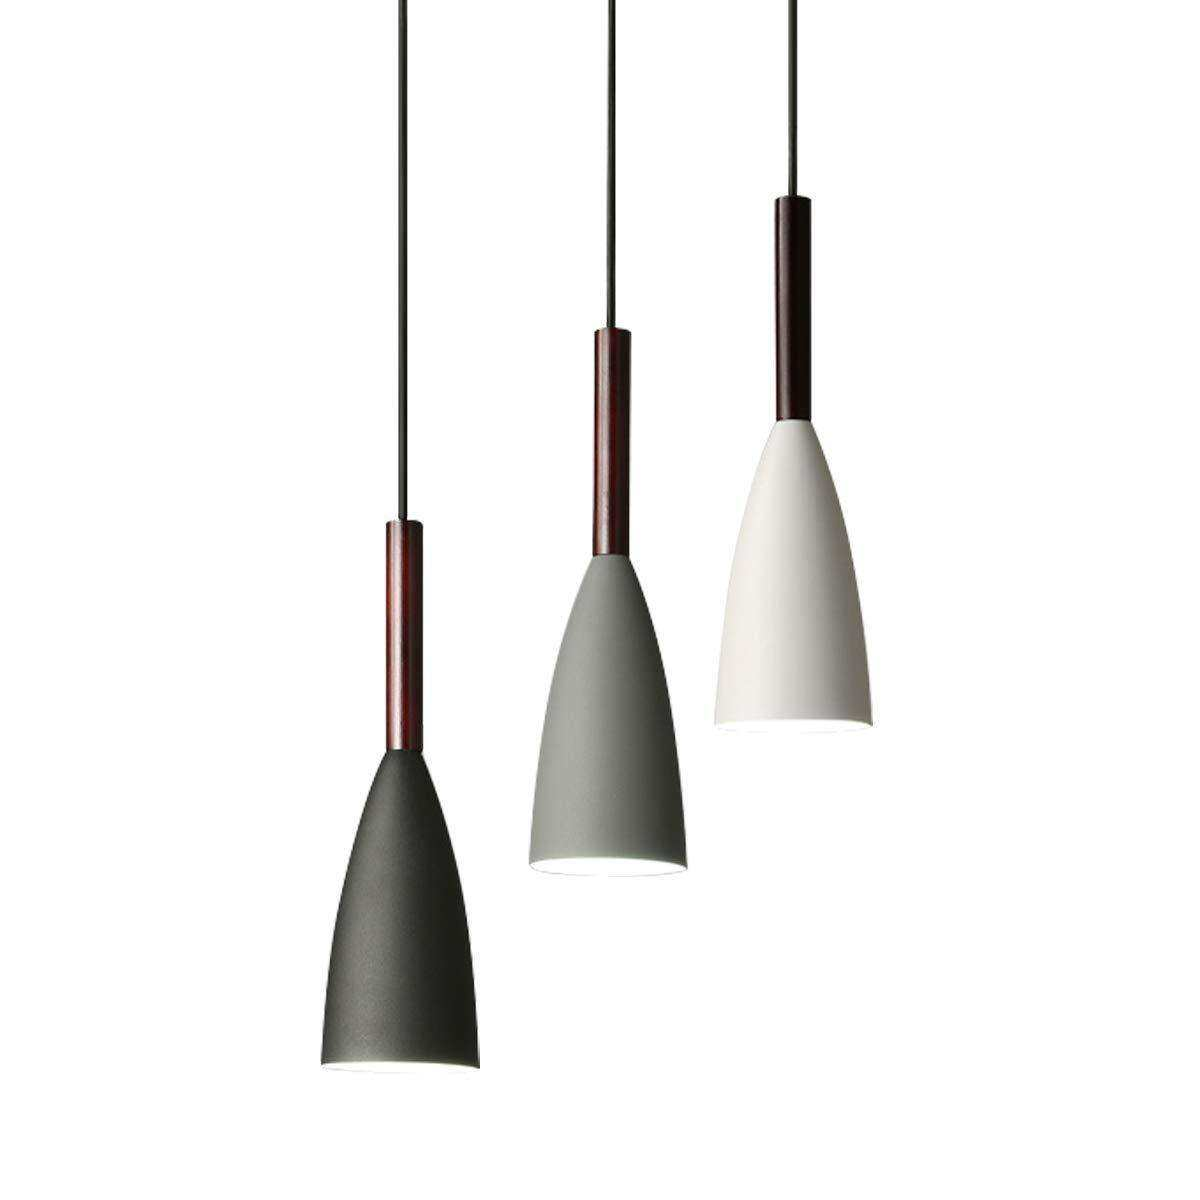 Modern 3 Pendant Lighting Nordic Minimalist Pendant Lights Dining Table Kitchen Island Hanging Lamps Dining Room Lights E27 Free Shiping Lazada Ph